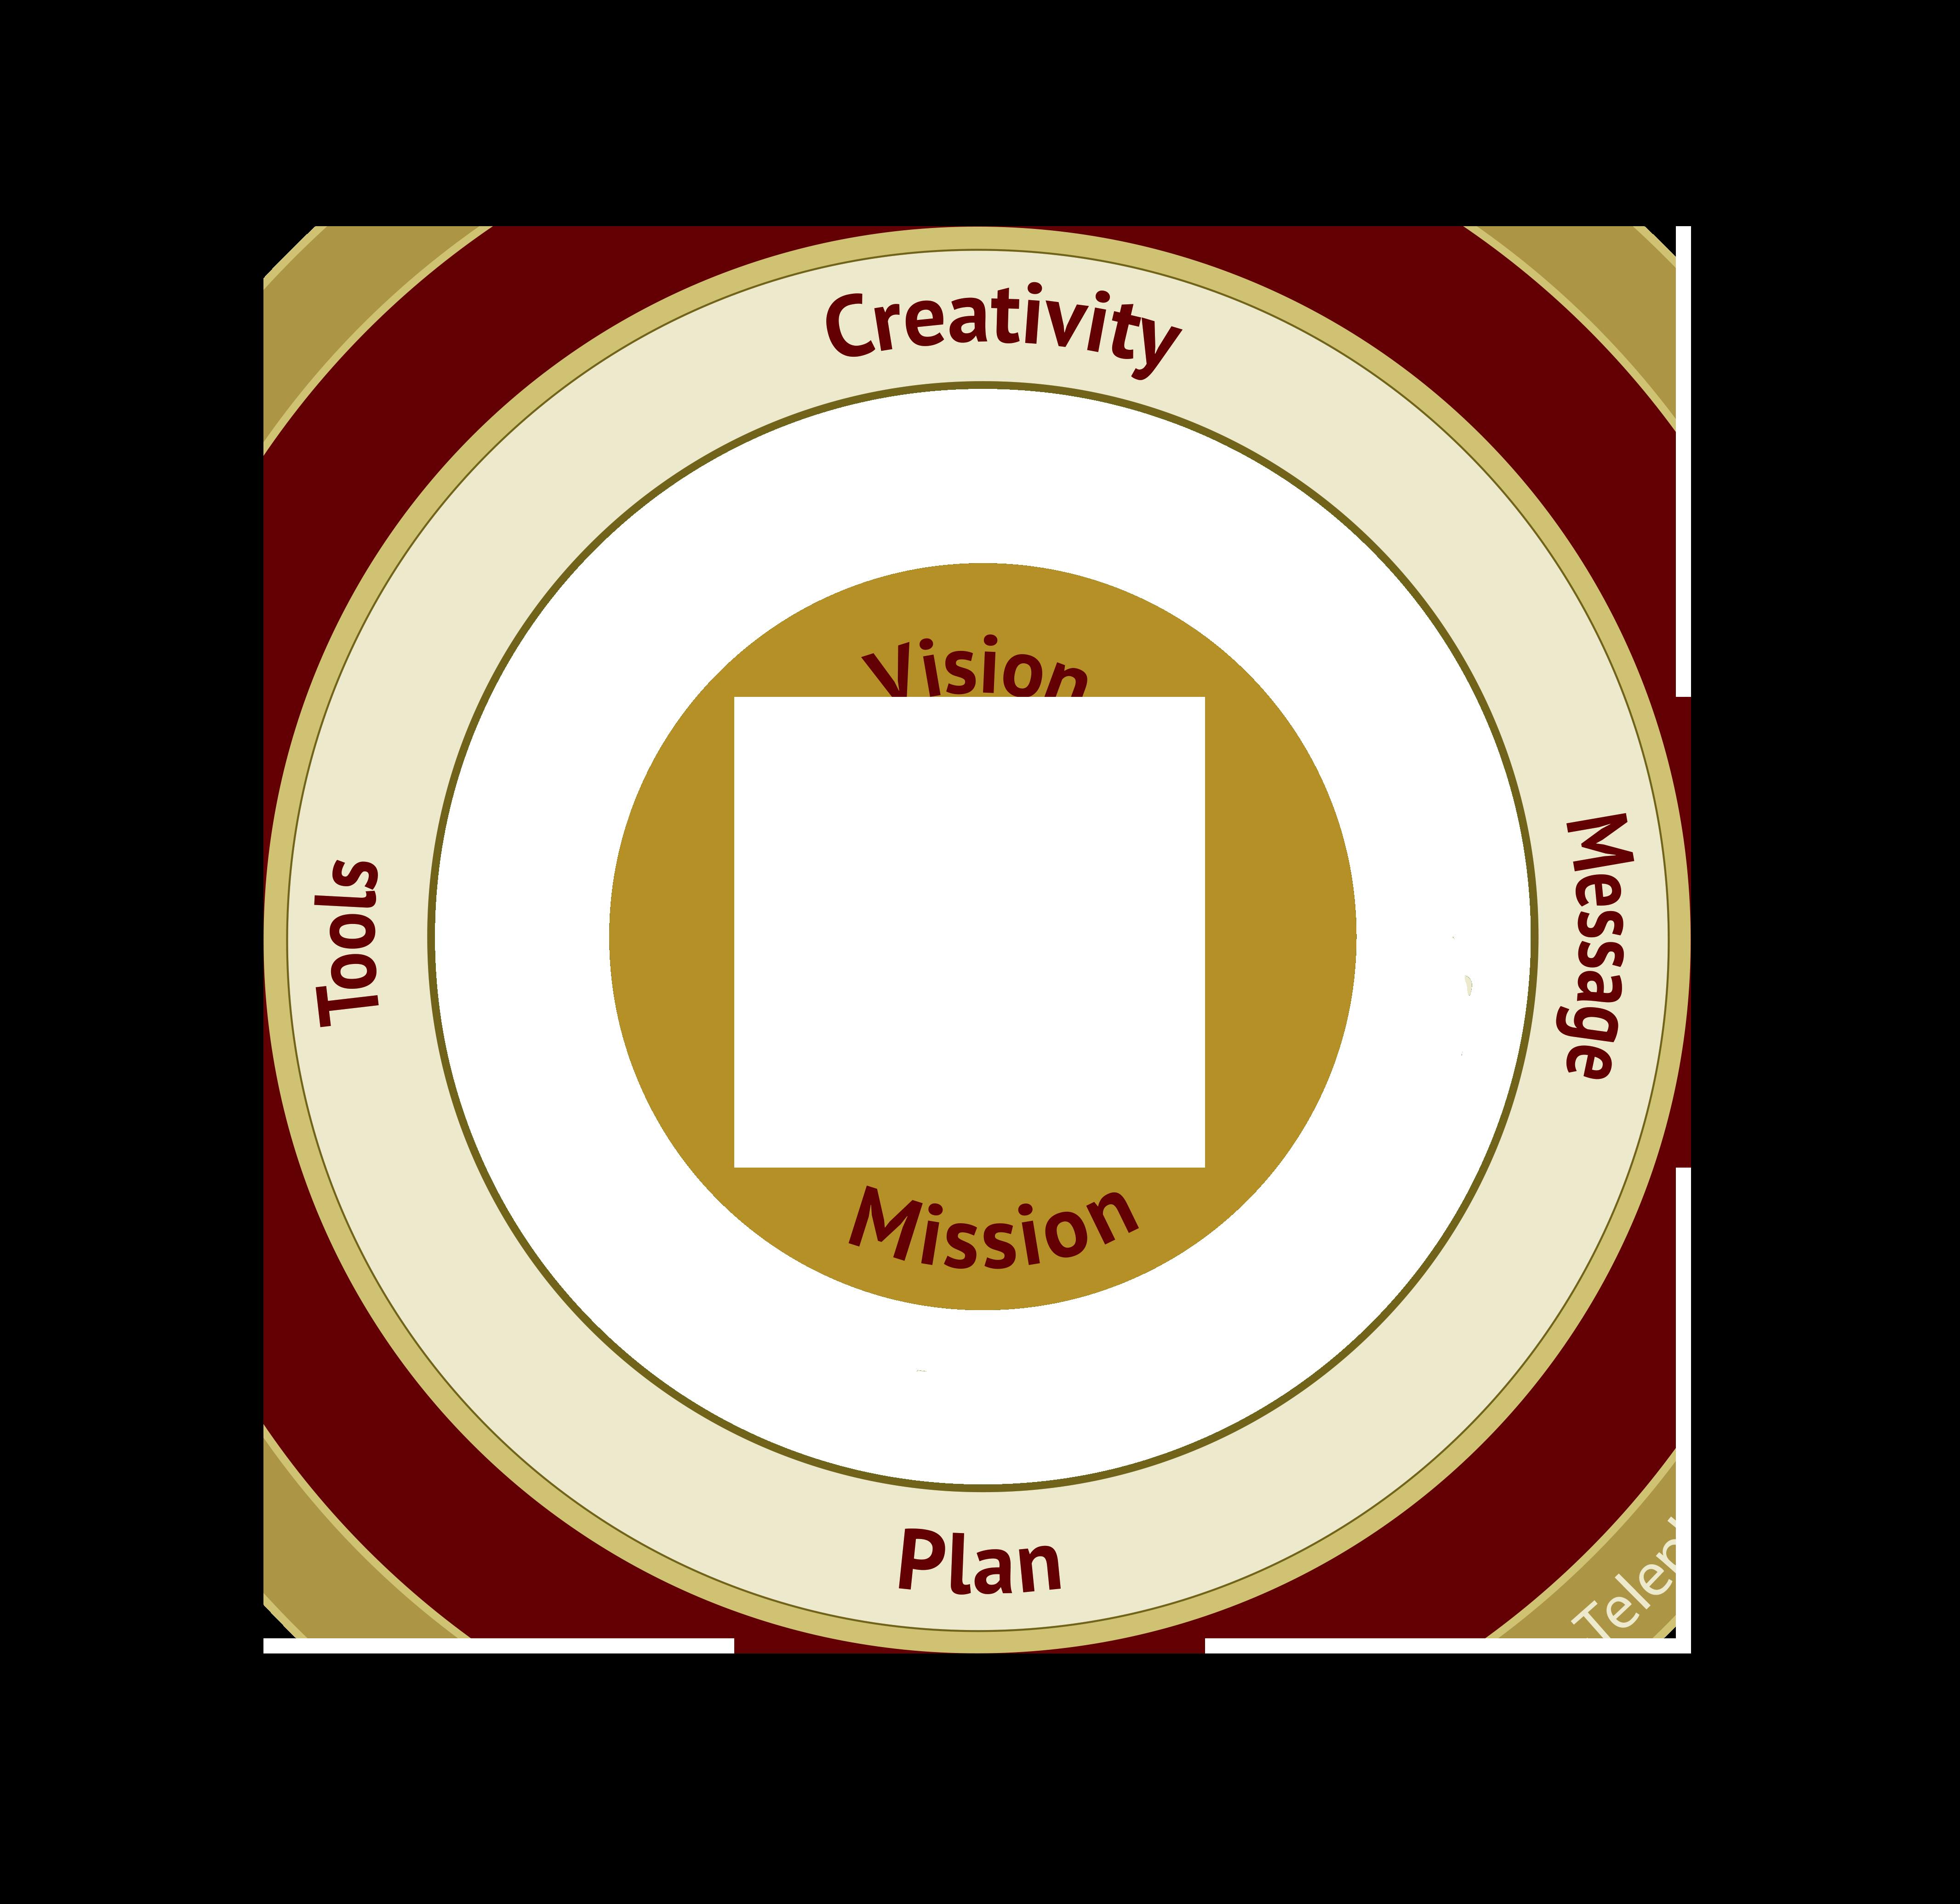 creativity, plan, tools, message